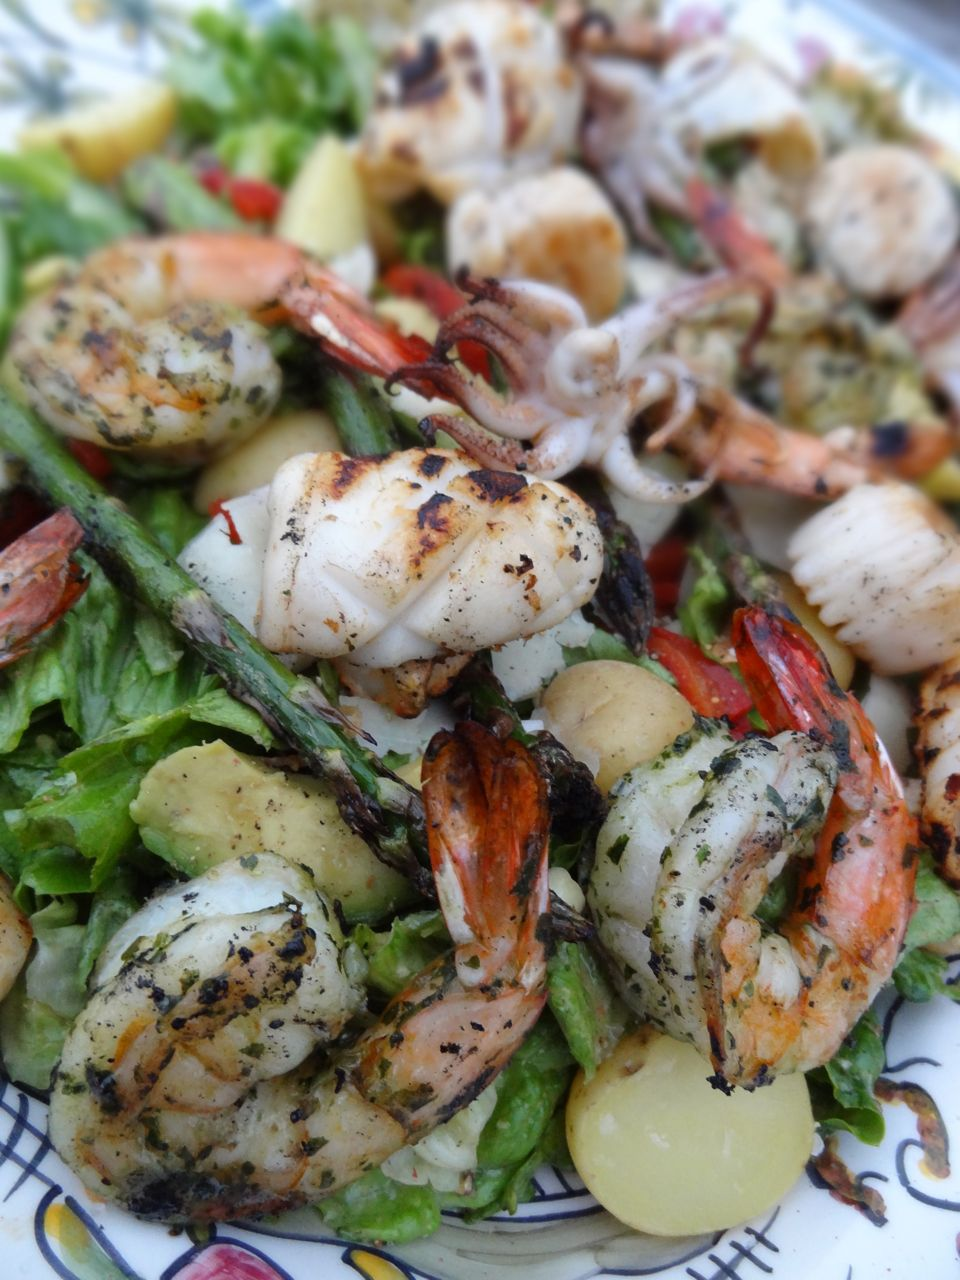 Scrumpdillyicious: Grilled Tiger Shrimp, Scallop & Calamari Salad